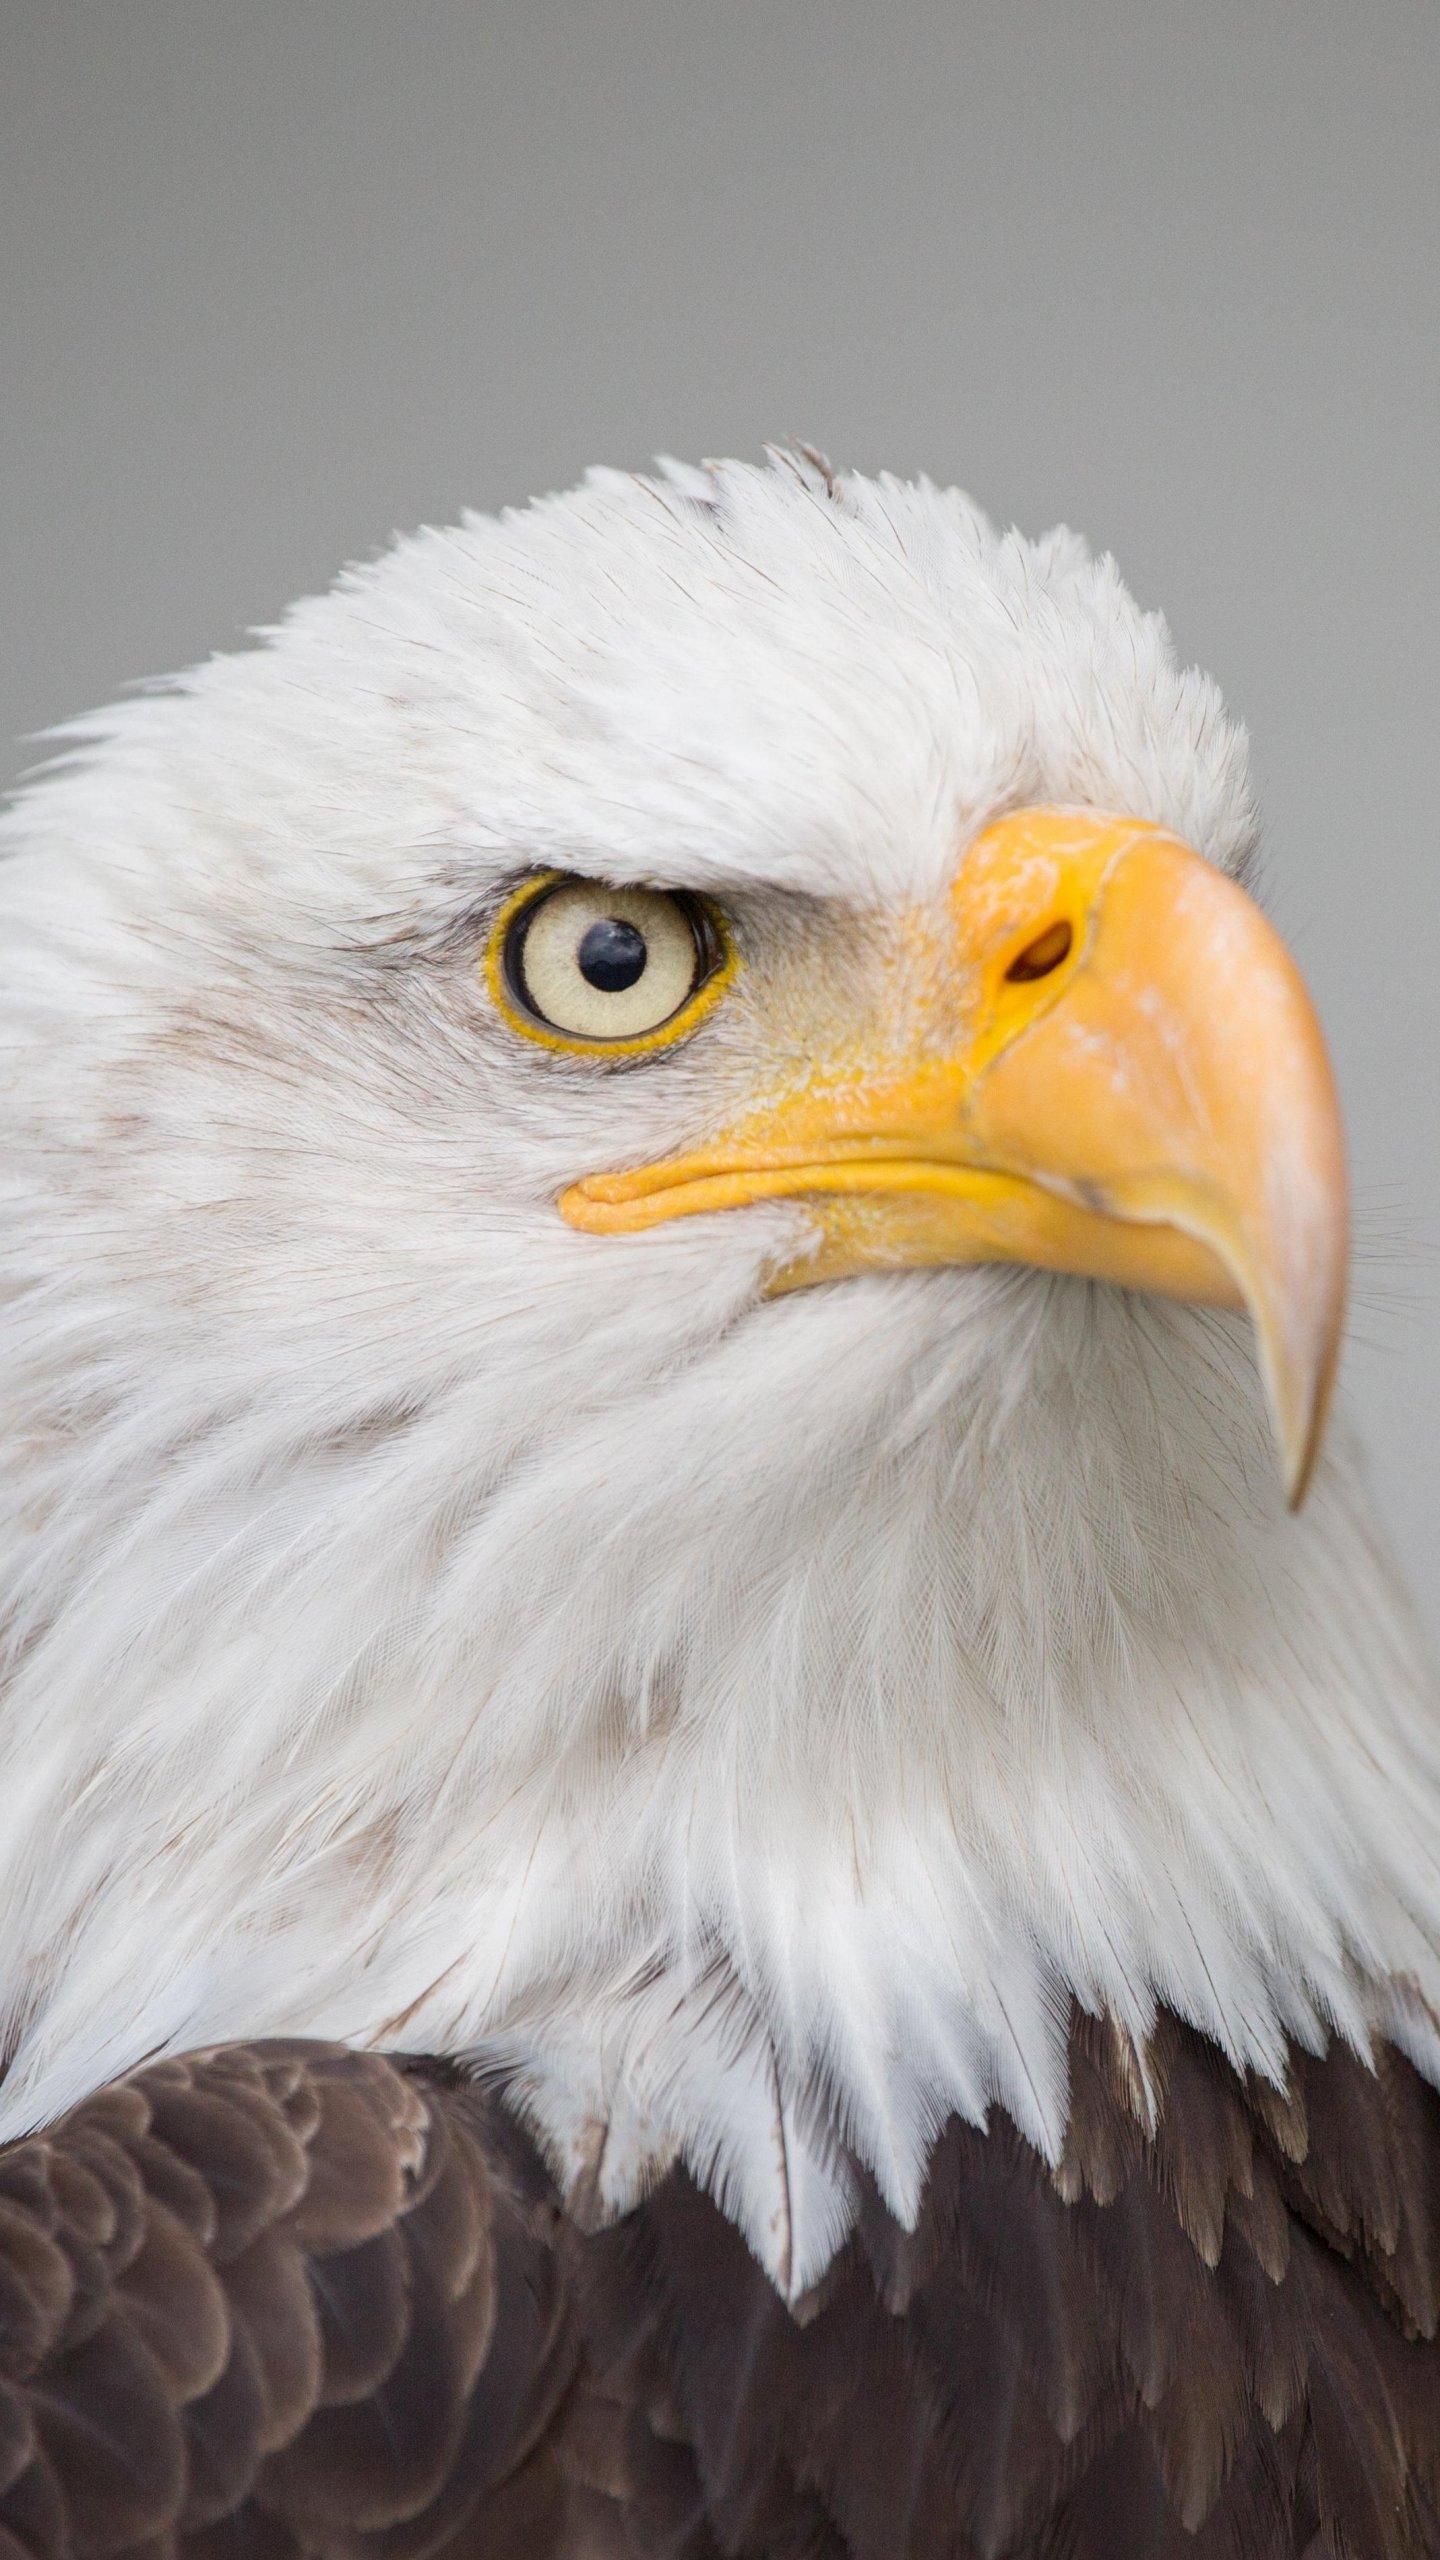 Bald Eagle Wallpaper   iPhone Android Desktop Backgrounds 1440x2560